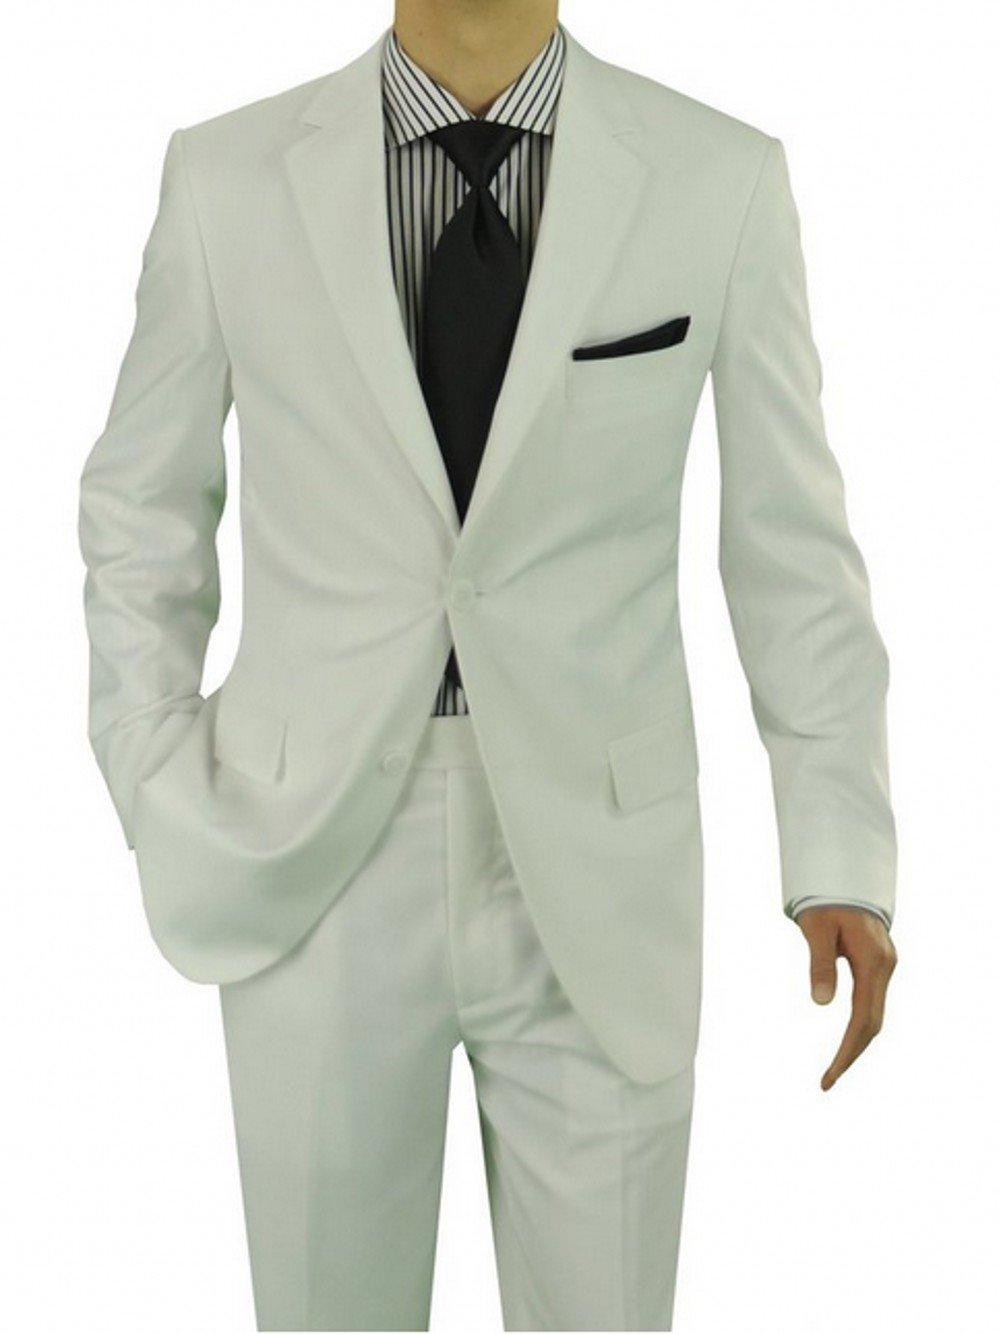 Love Dress Men's Two Button Suit White Two Piece (Jacket and Pant) XXXXXXL